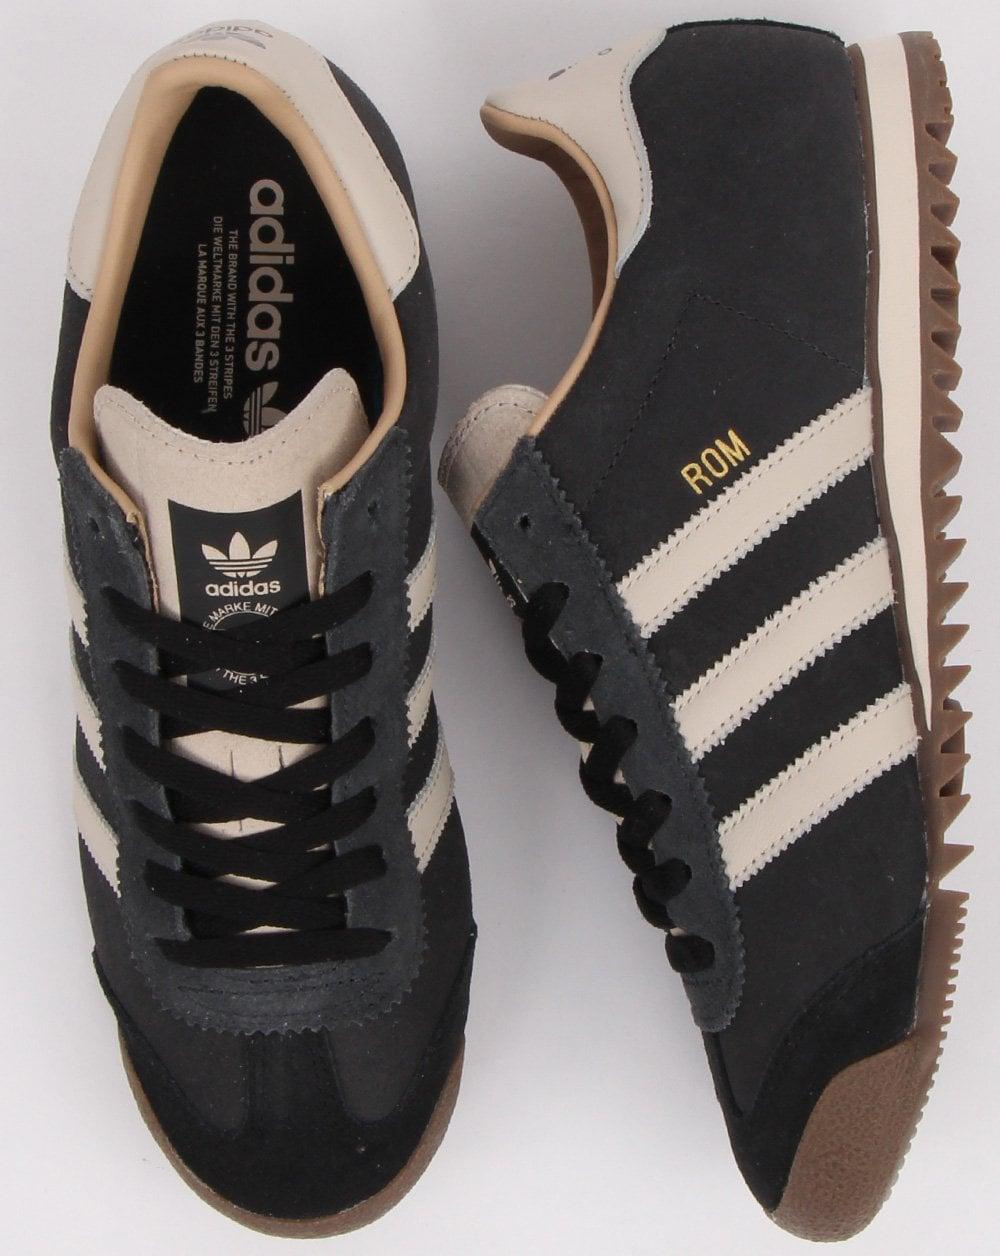 Adidas Rom Trainers Brown/Cream